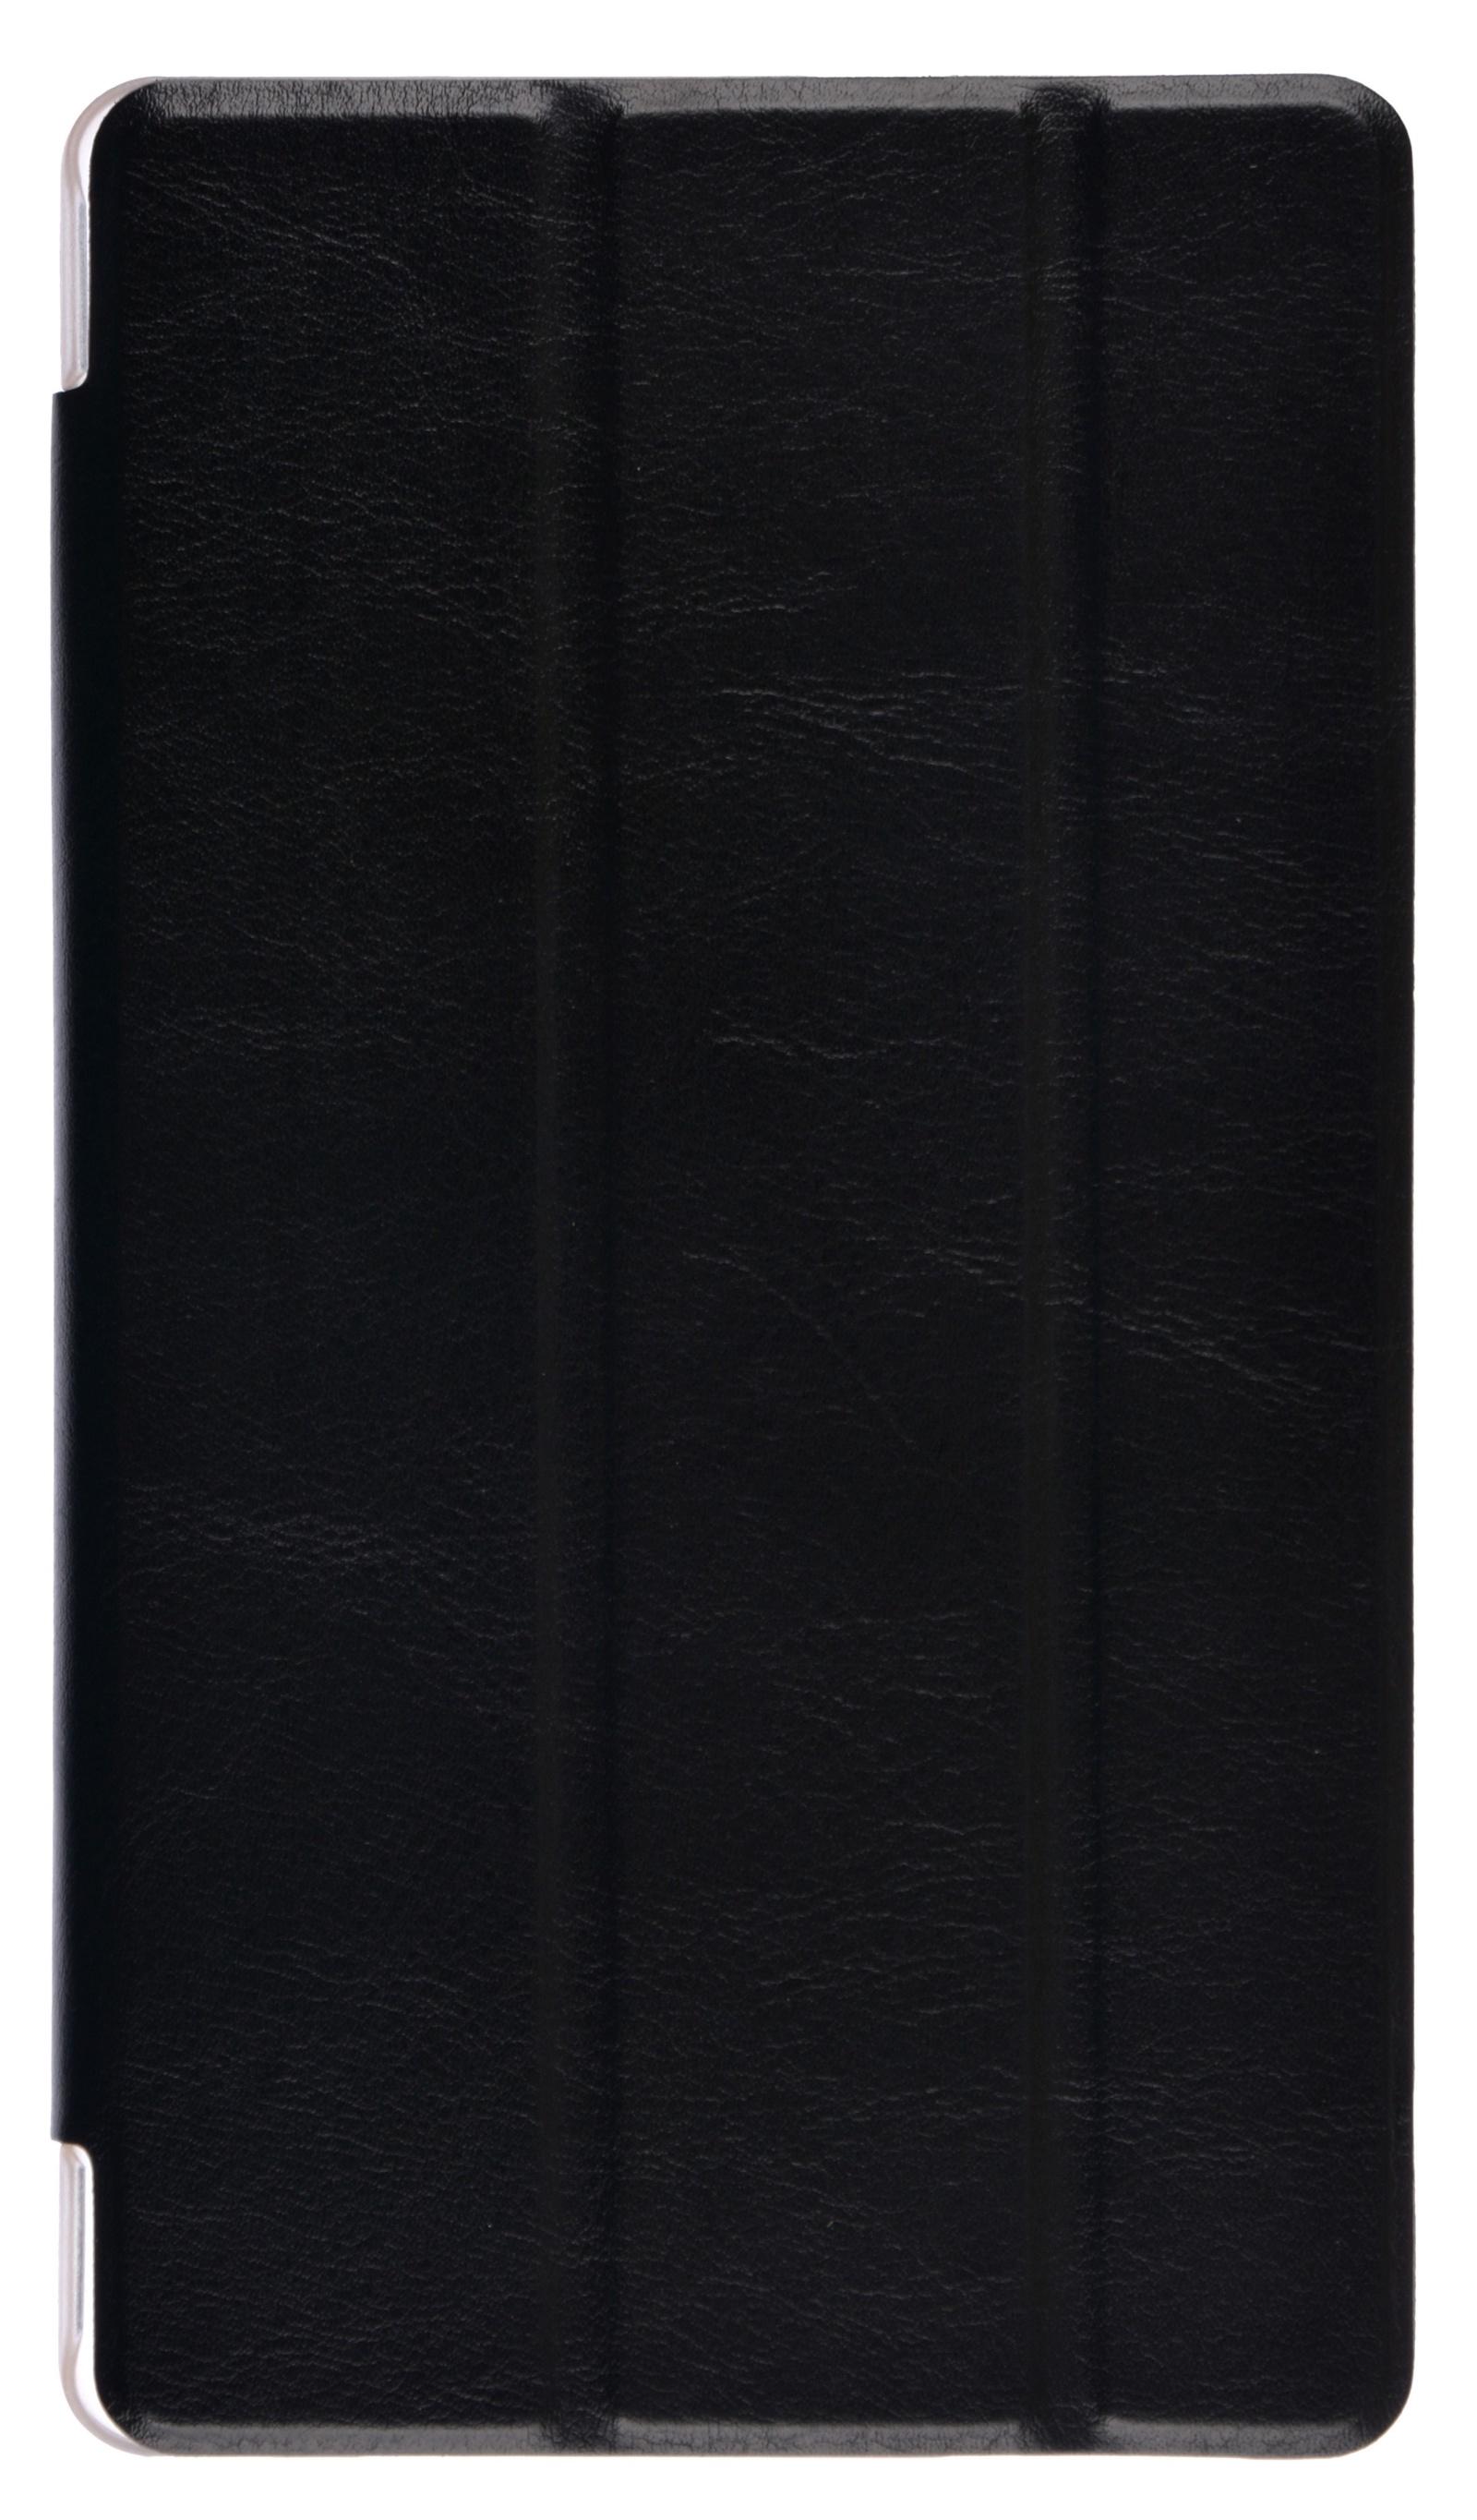 Чехол для планшета ProShield slim case, 4630042521216 для Huawei T3 7, черный new slim cover transparent pc back case for huawei mediapad t3 7 3g bg2 u01 tablet case t3 3g 7 0 screen protection stylus